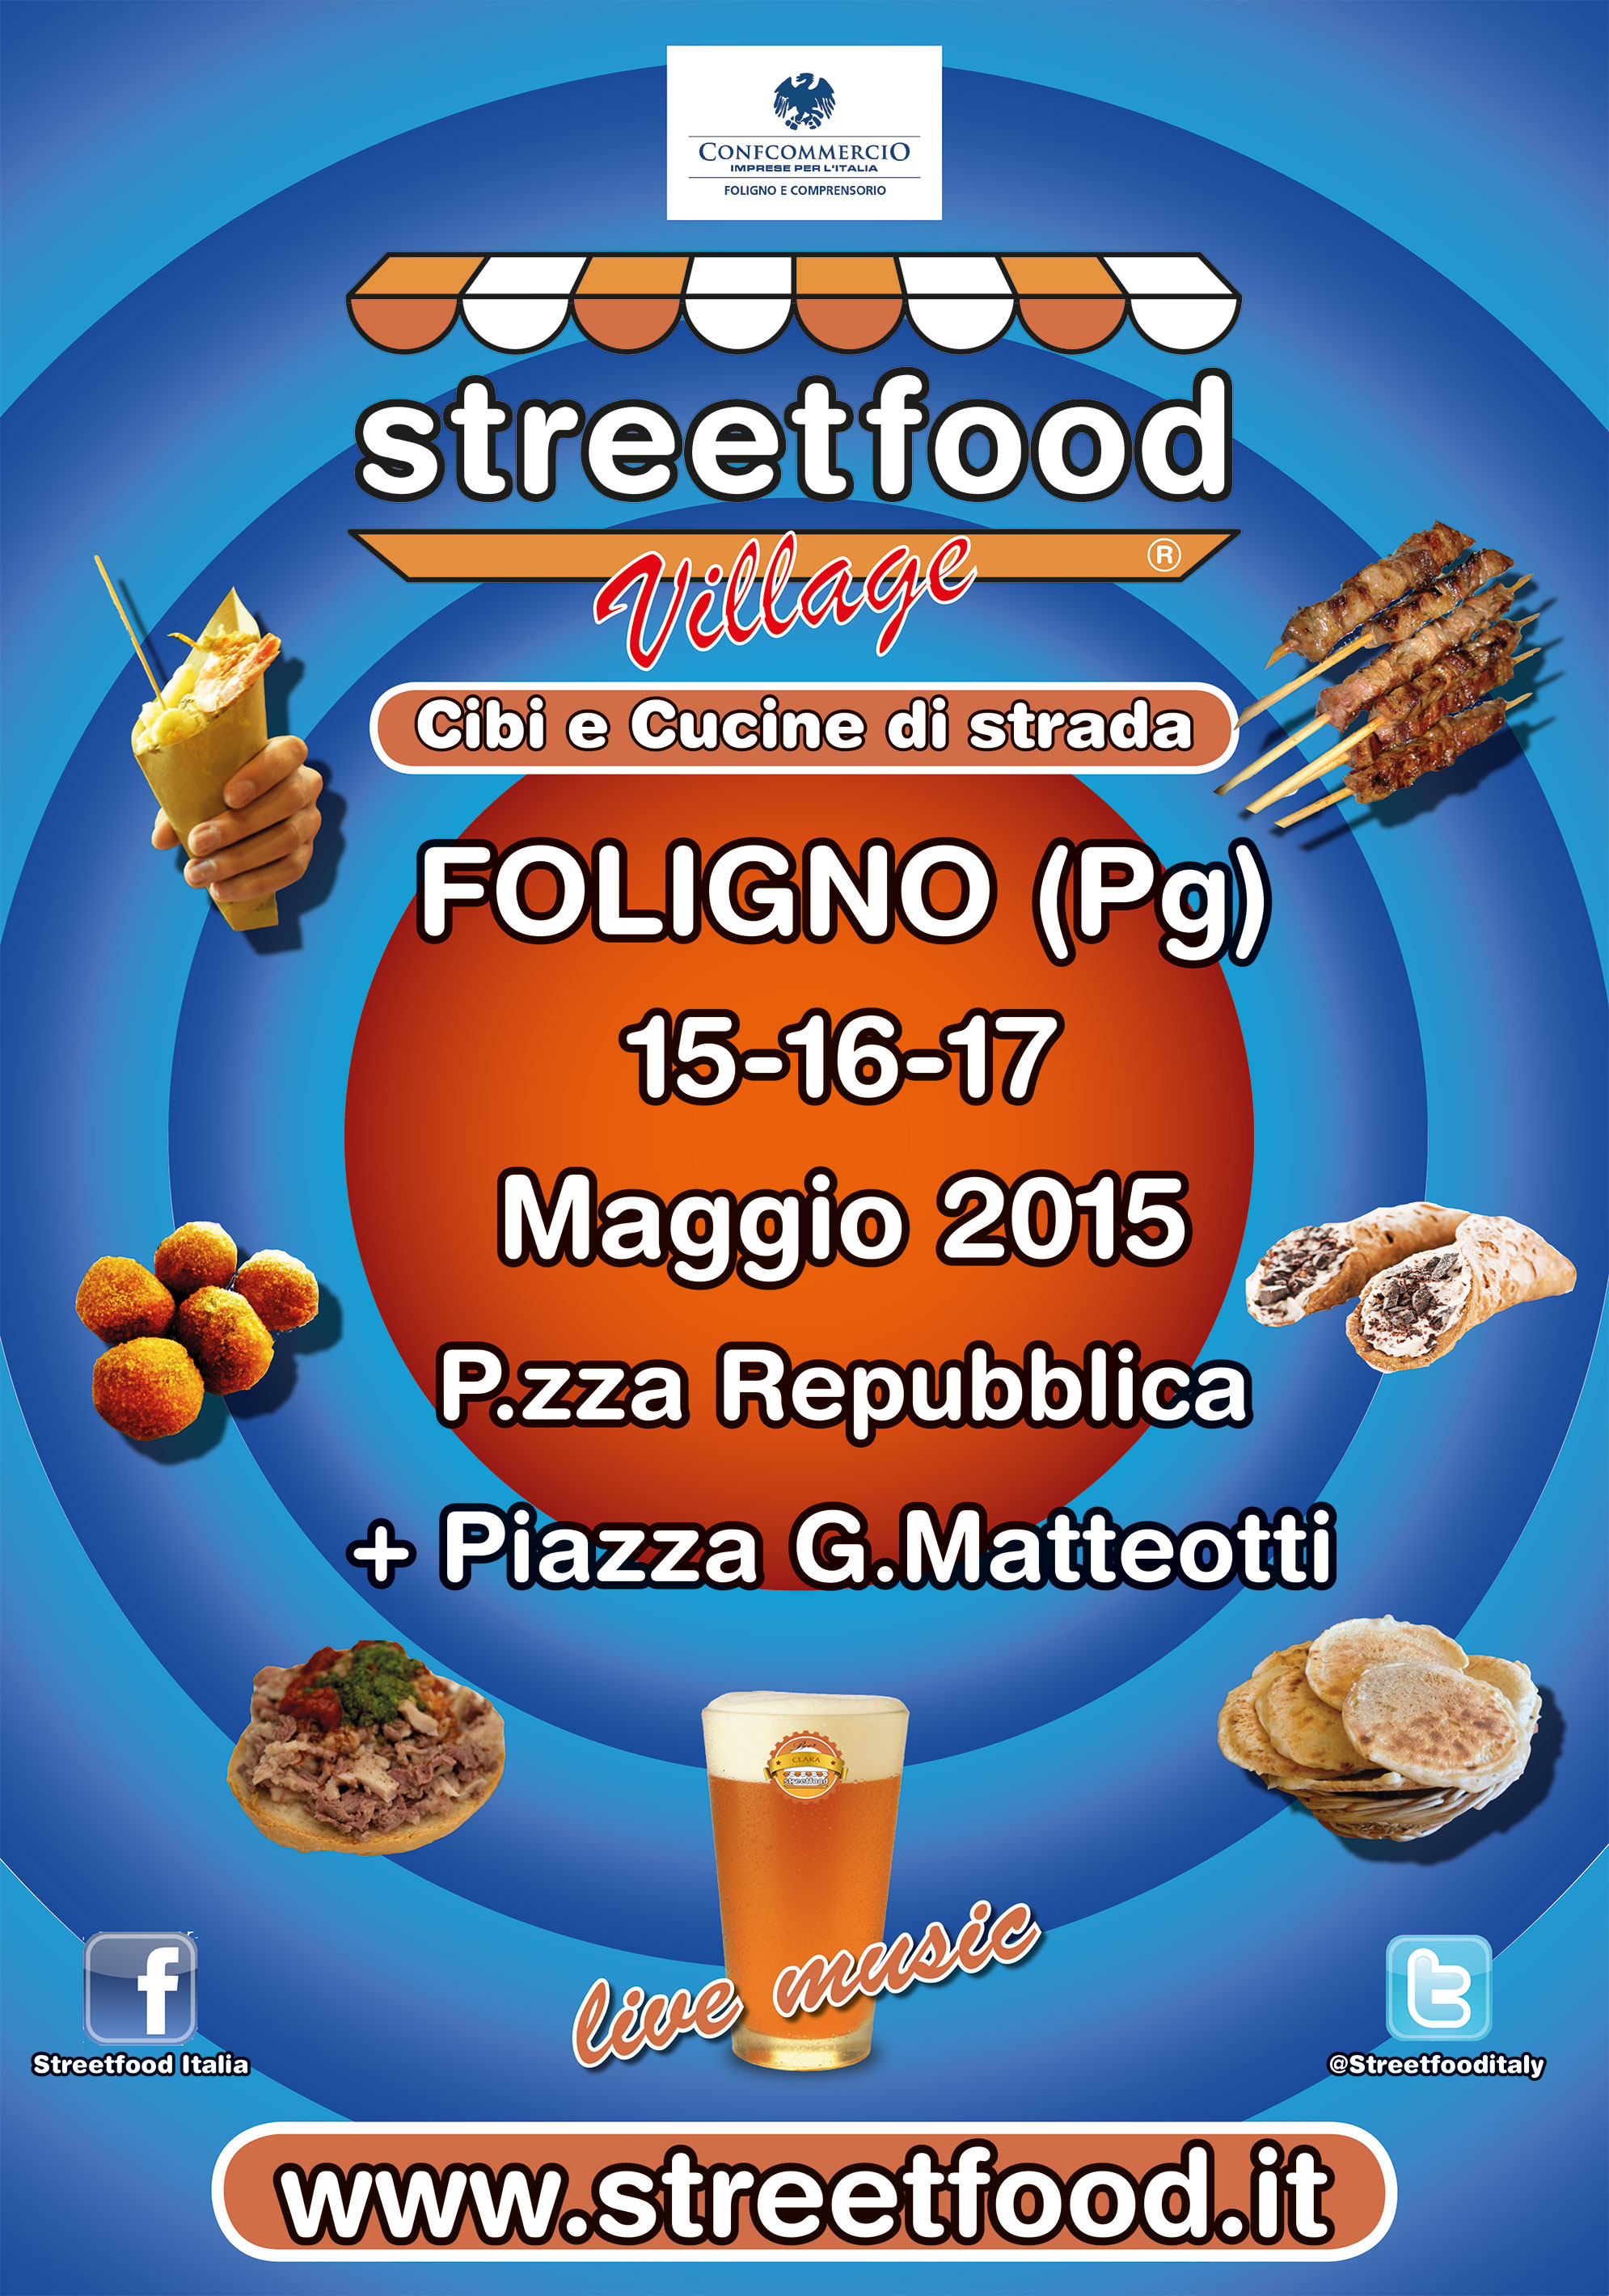 Streetfood Italia a Foligno